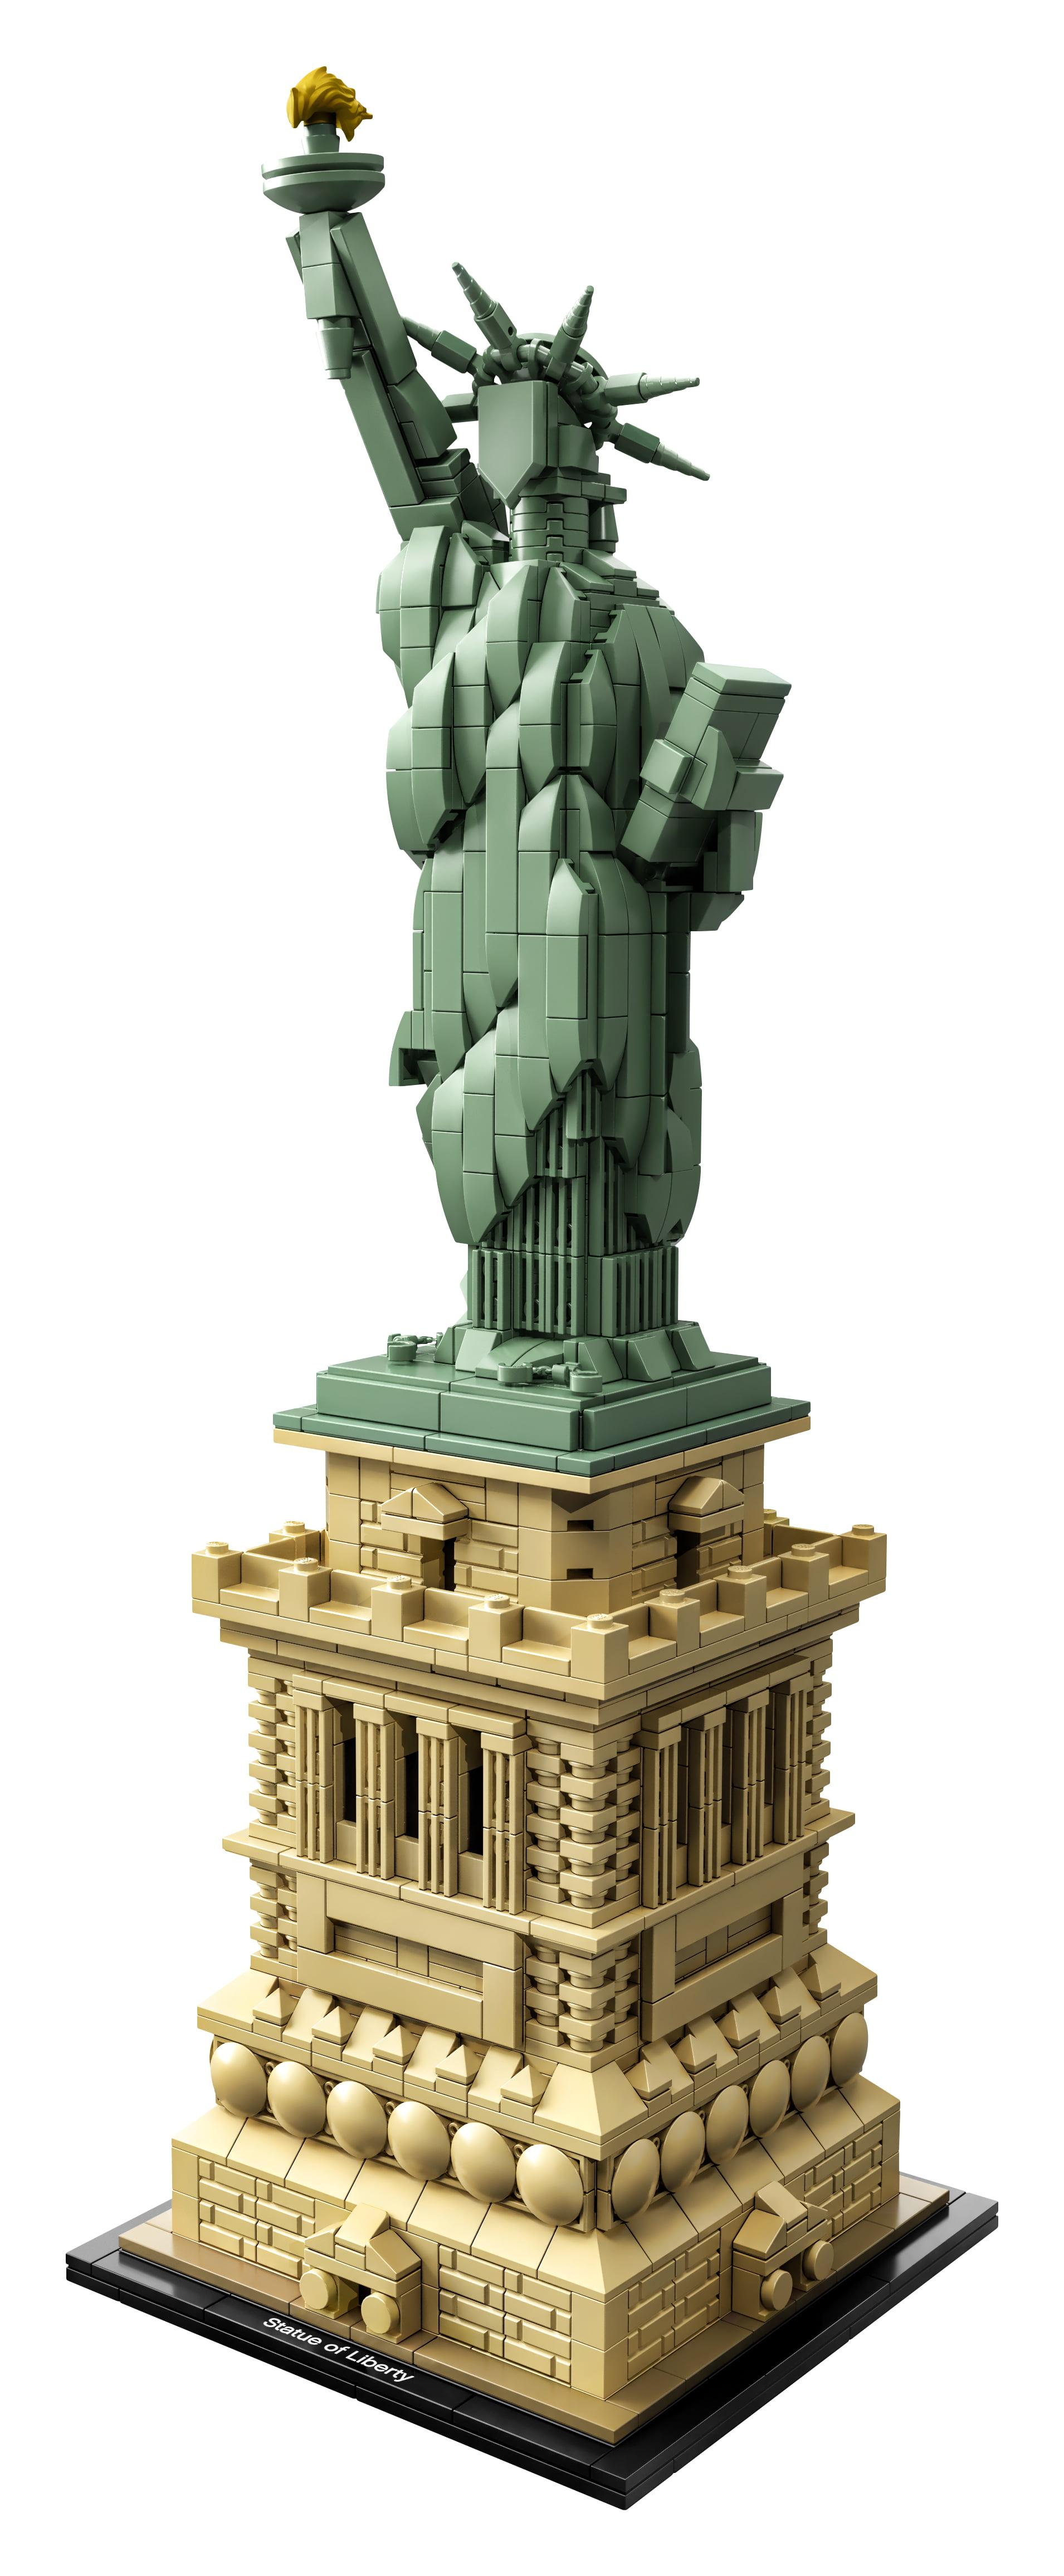 LEGO  Lot of 150 Sand Green Telescope Torch Minifigure Modular CITY Rail Pieces